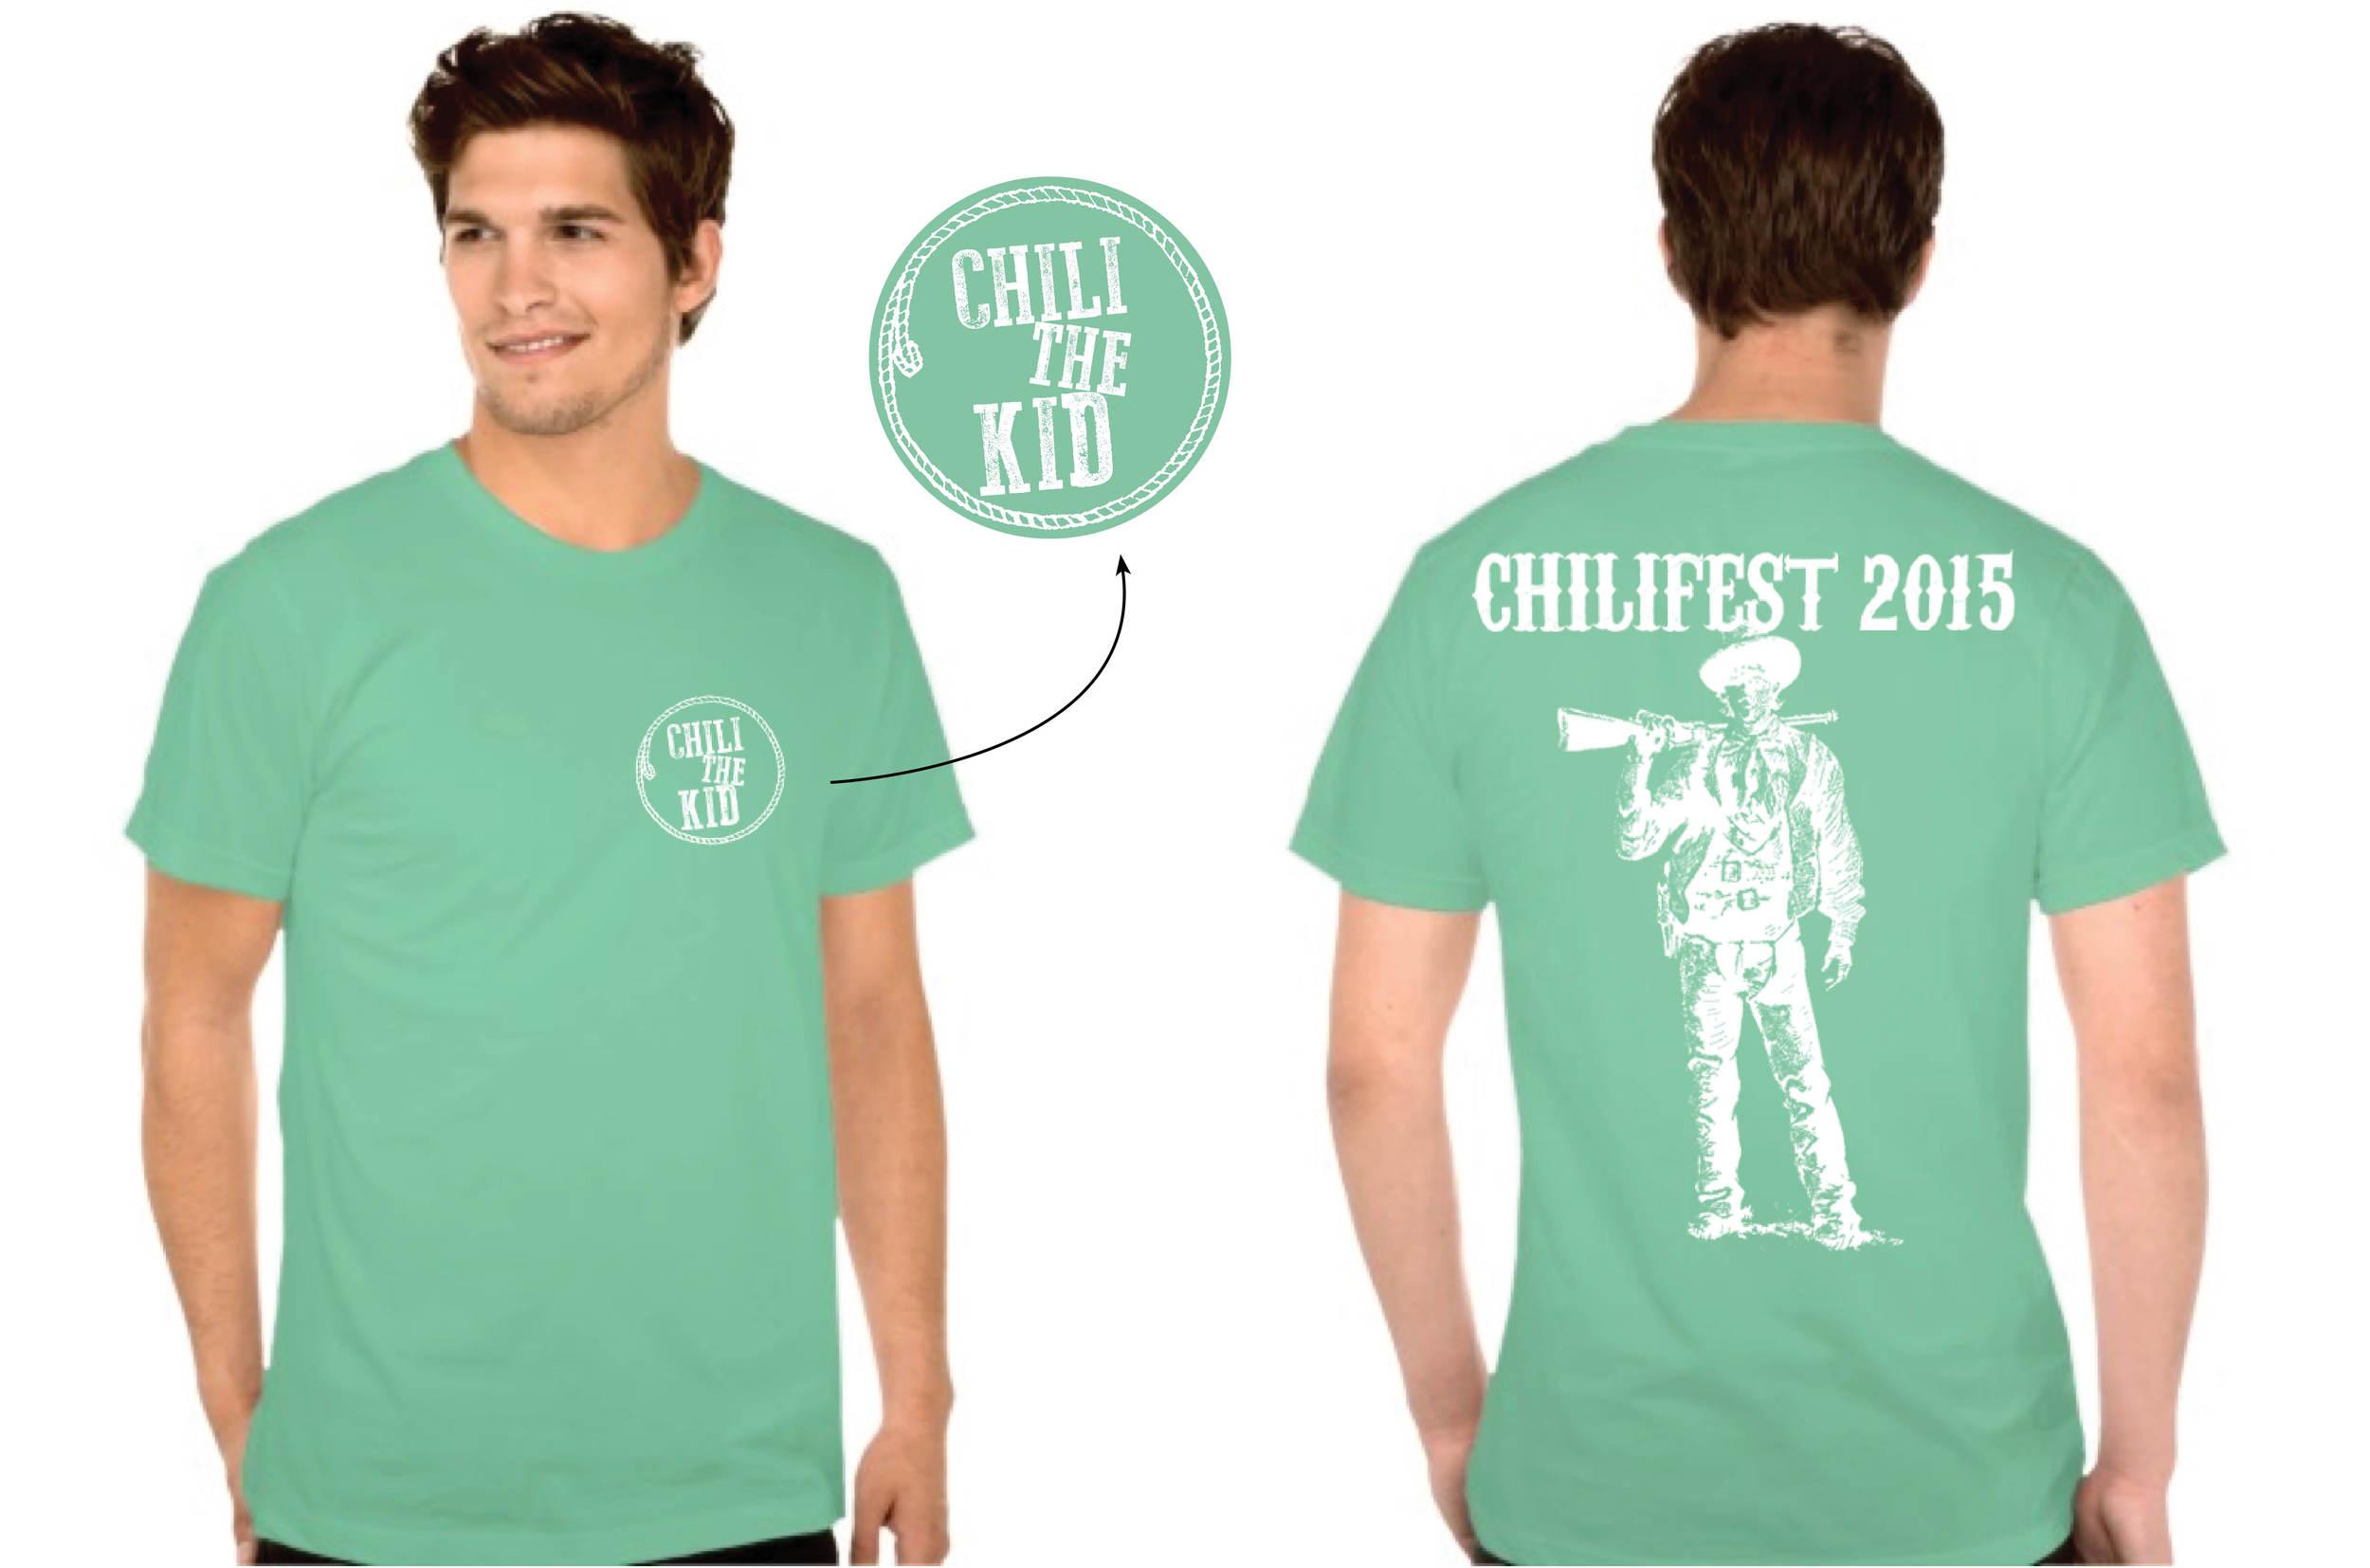 Chilifest Mint Shirt copy.jpg